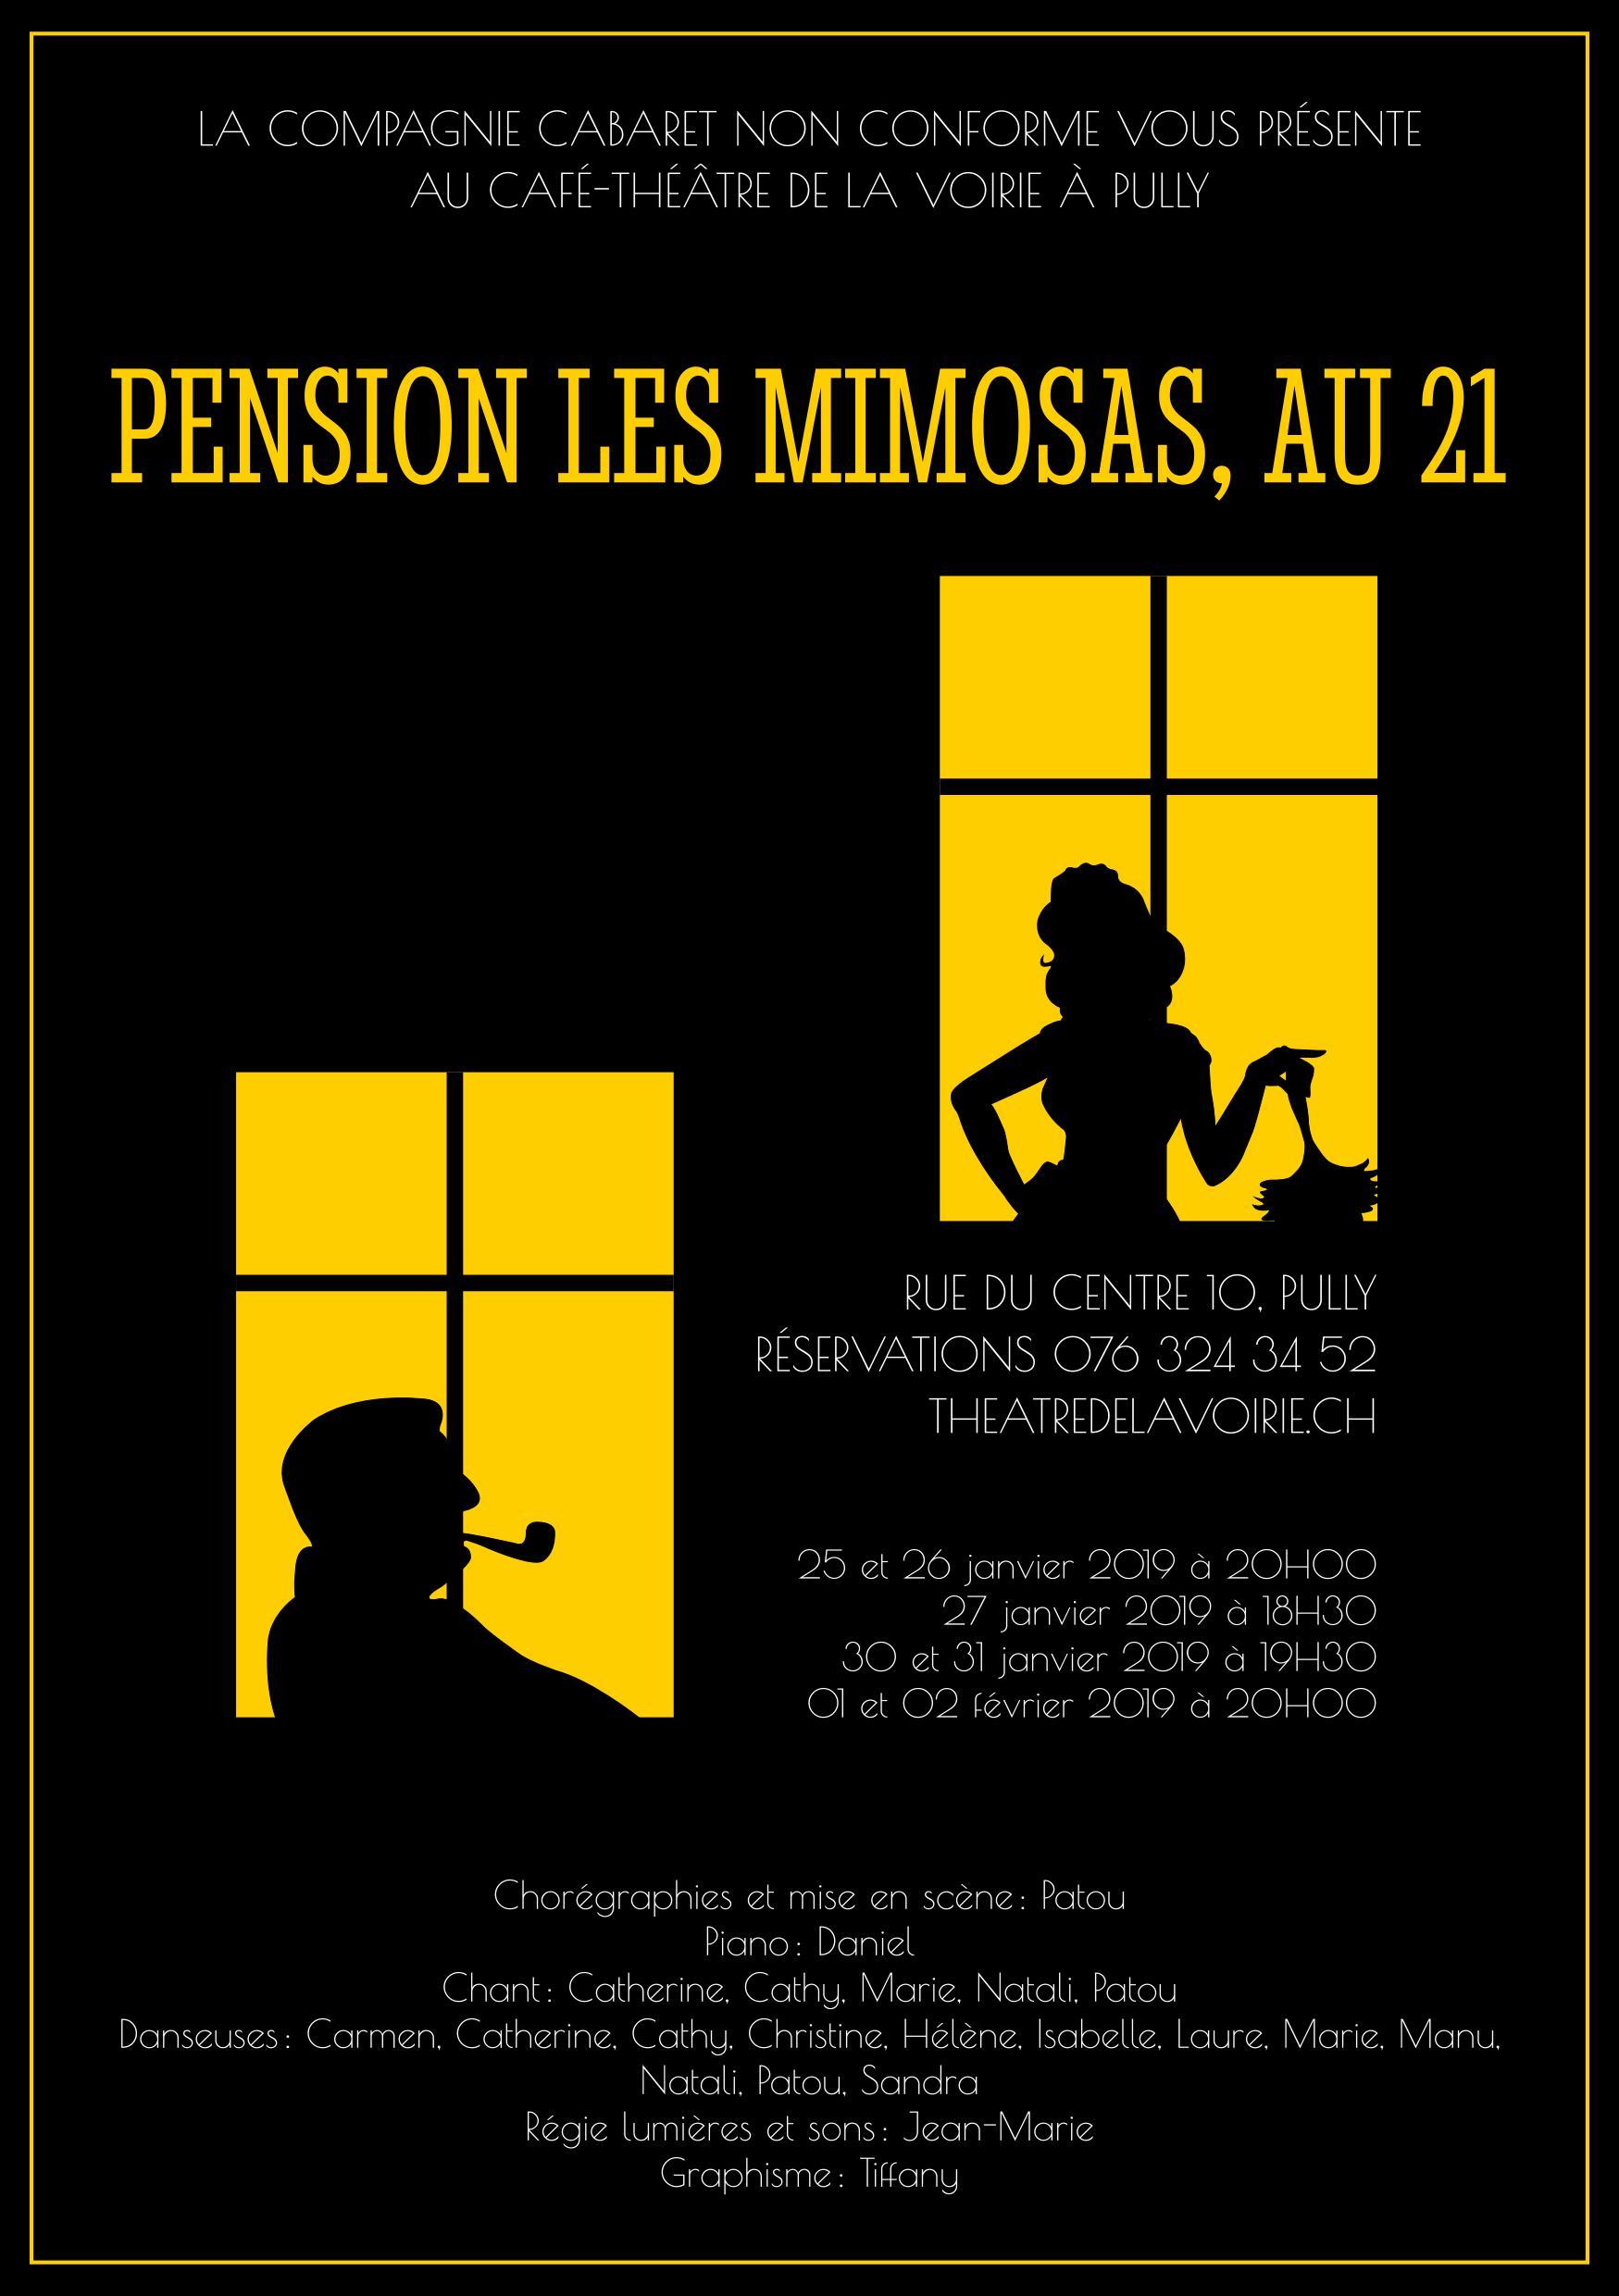 Pension les mimosas